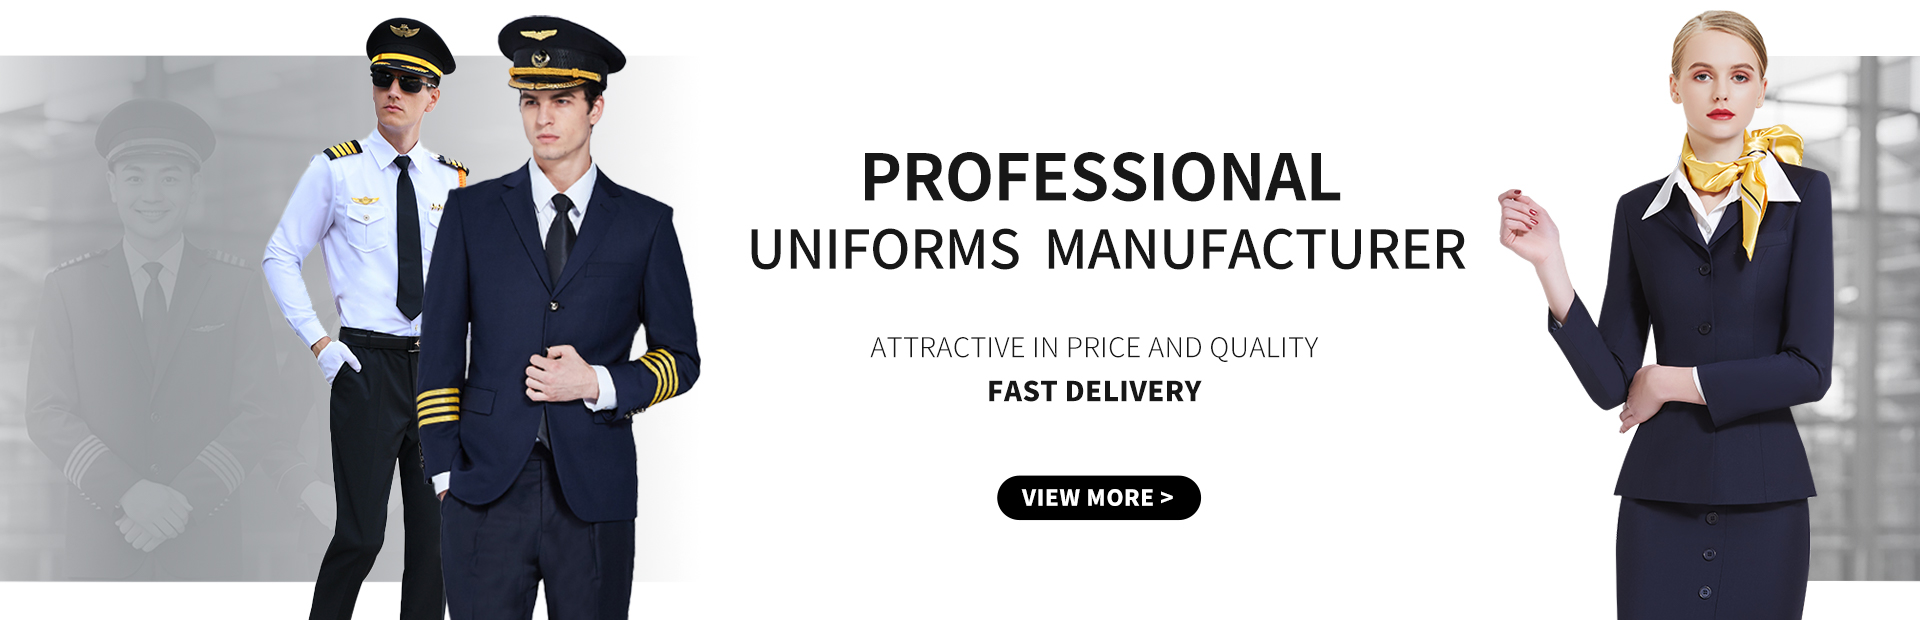 Chinese uniforms manufacturer